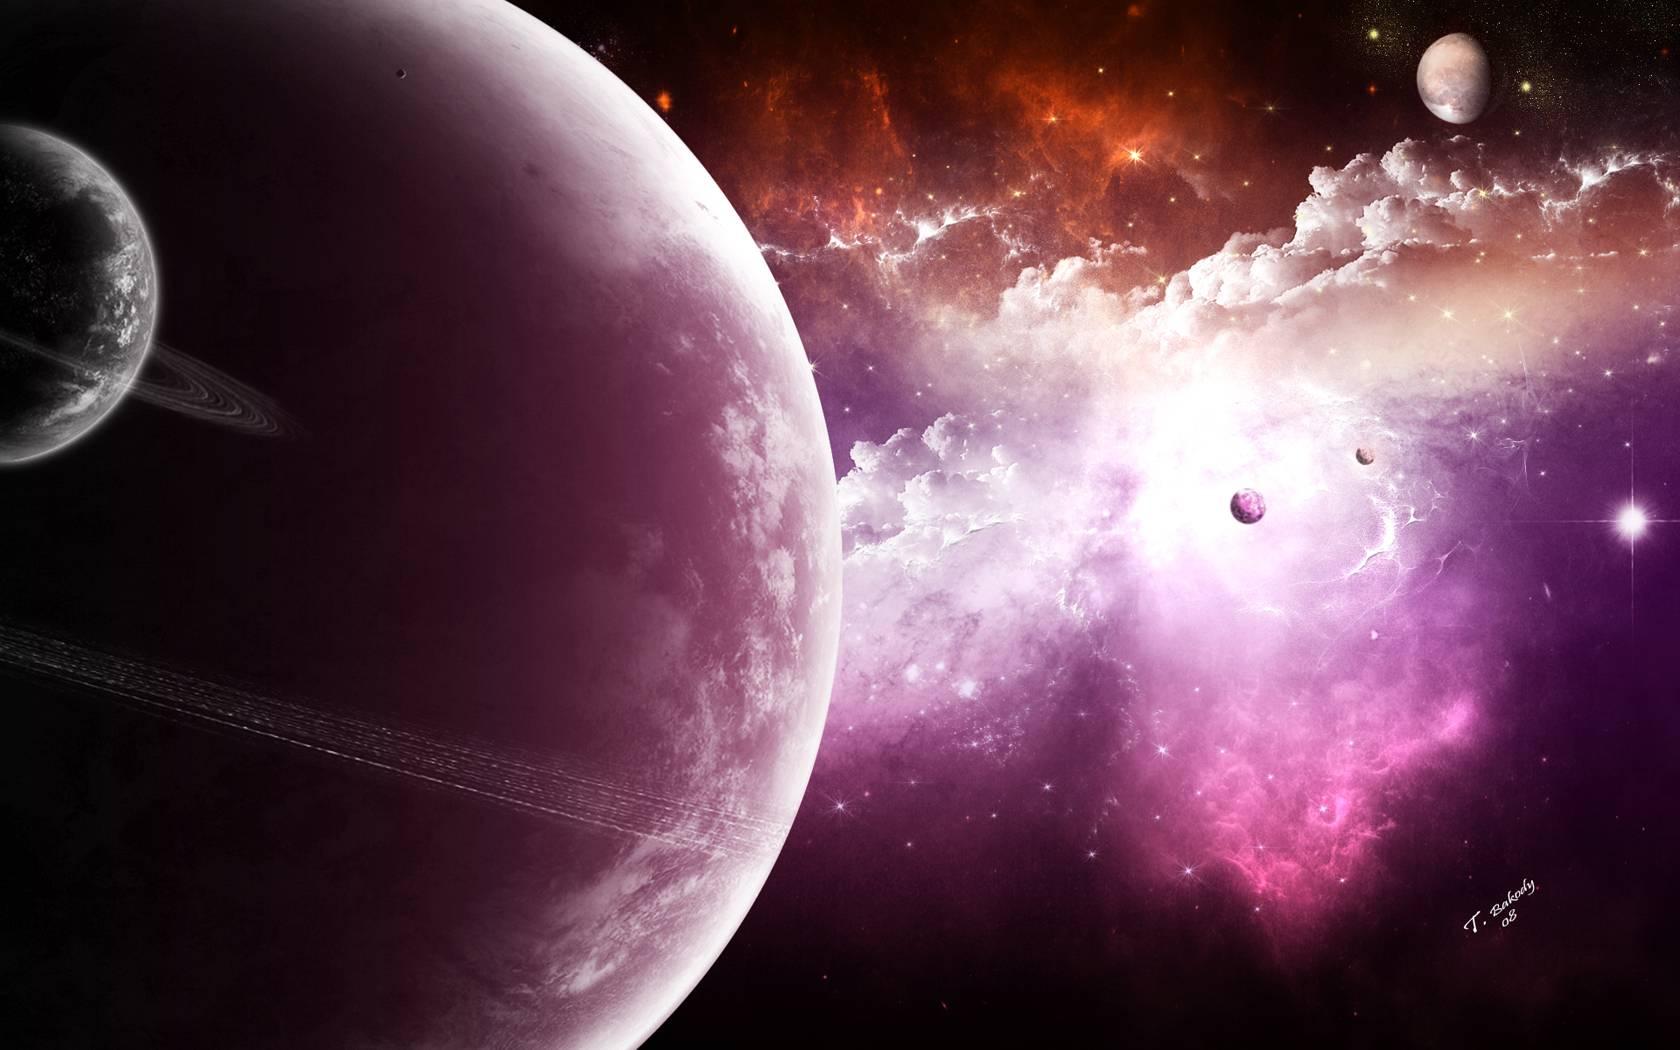 Fantasy Space Nebulax Backgrounds